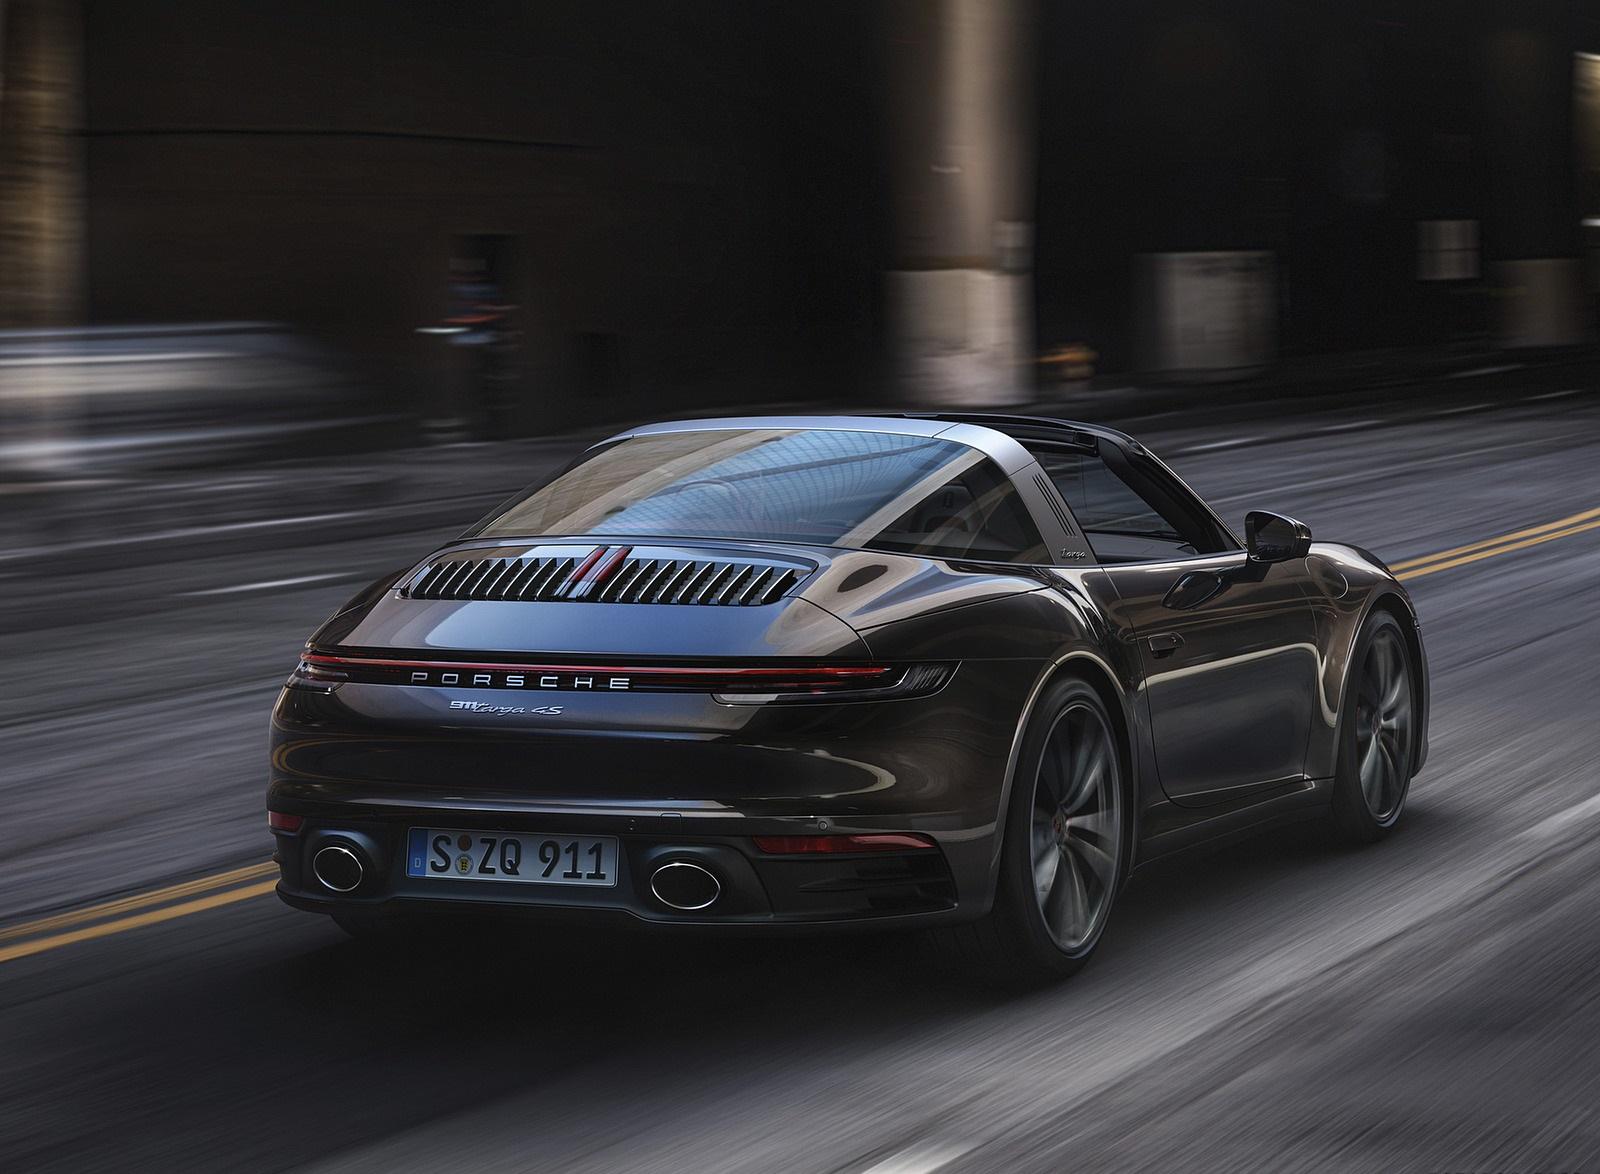 2021 Porsche 911 Targa 4S Rear Three-Quarter Wallpapers (5)